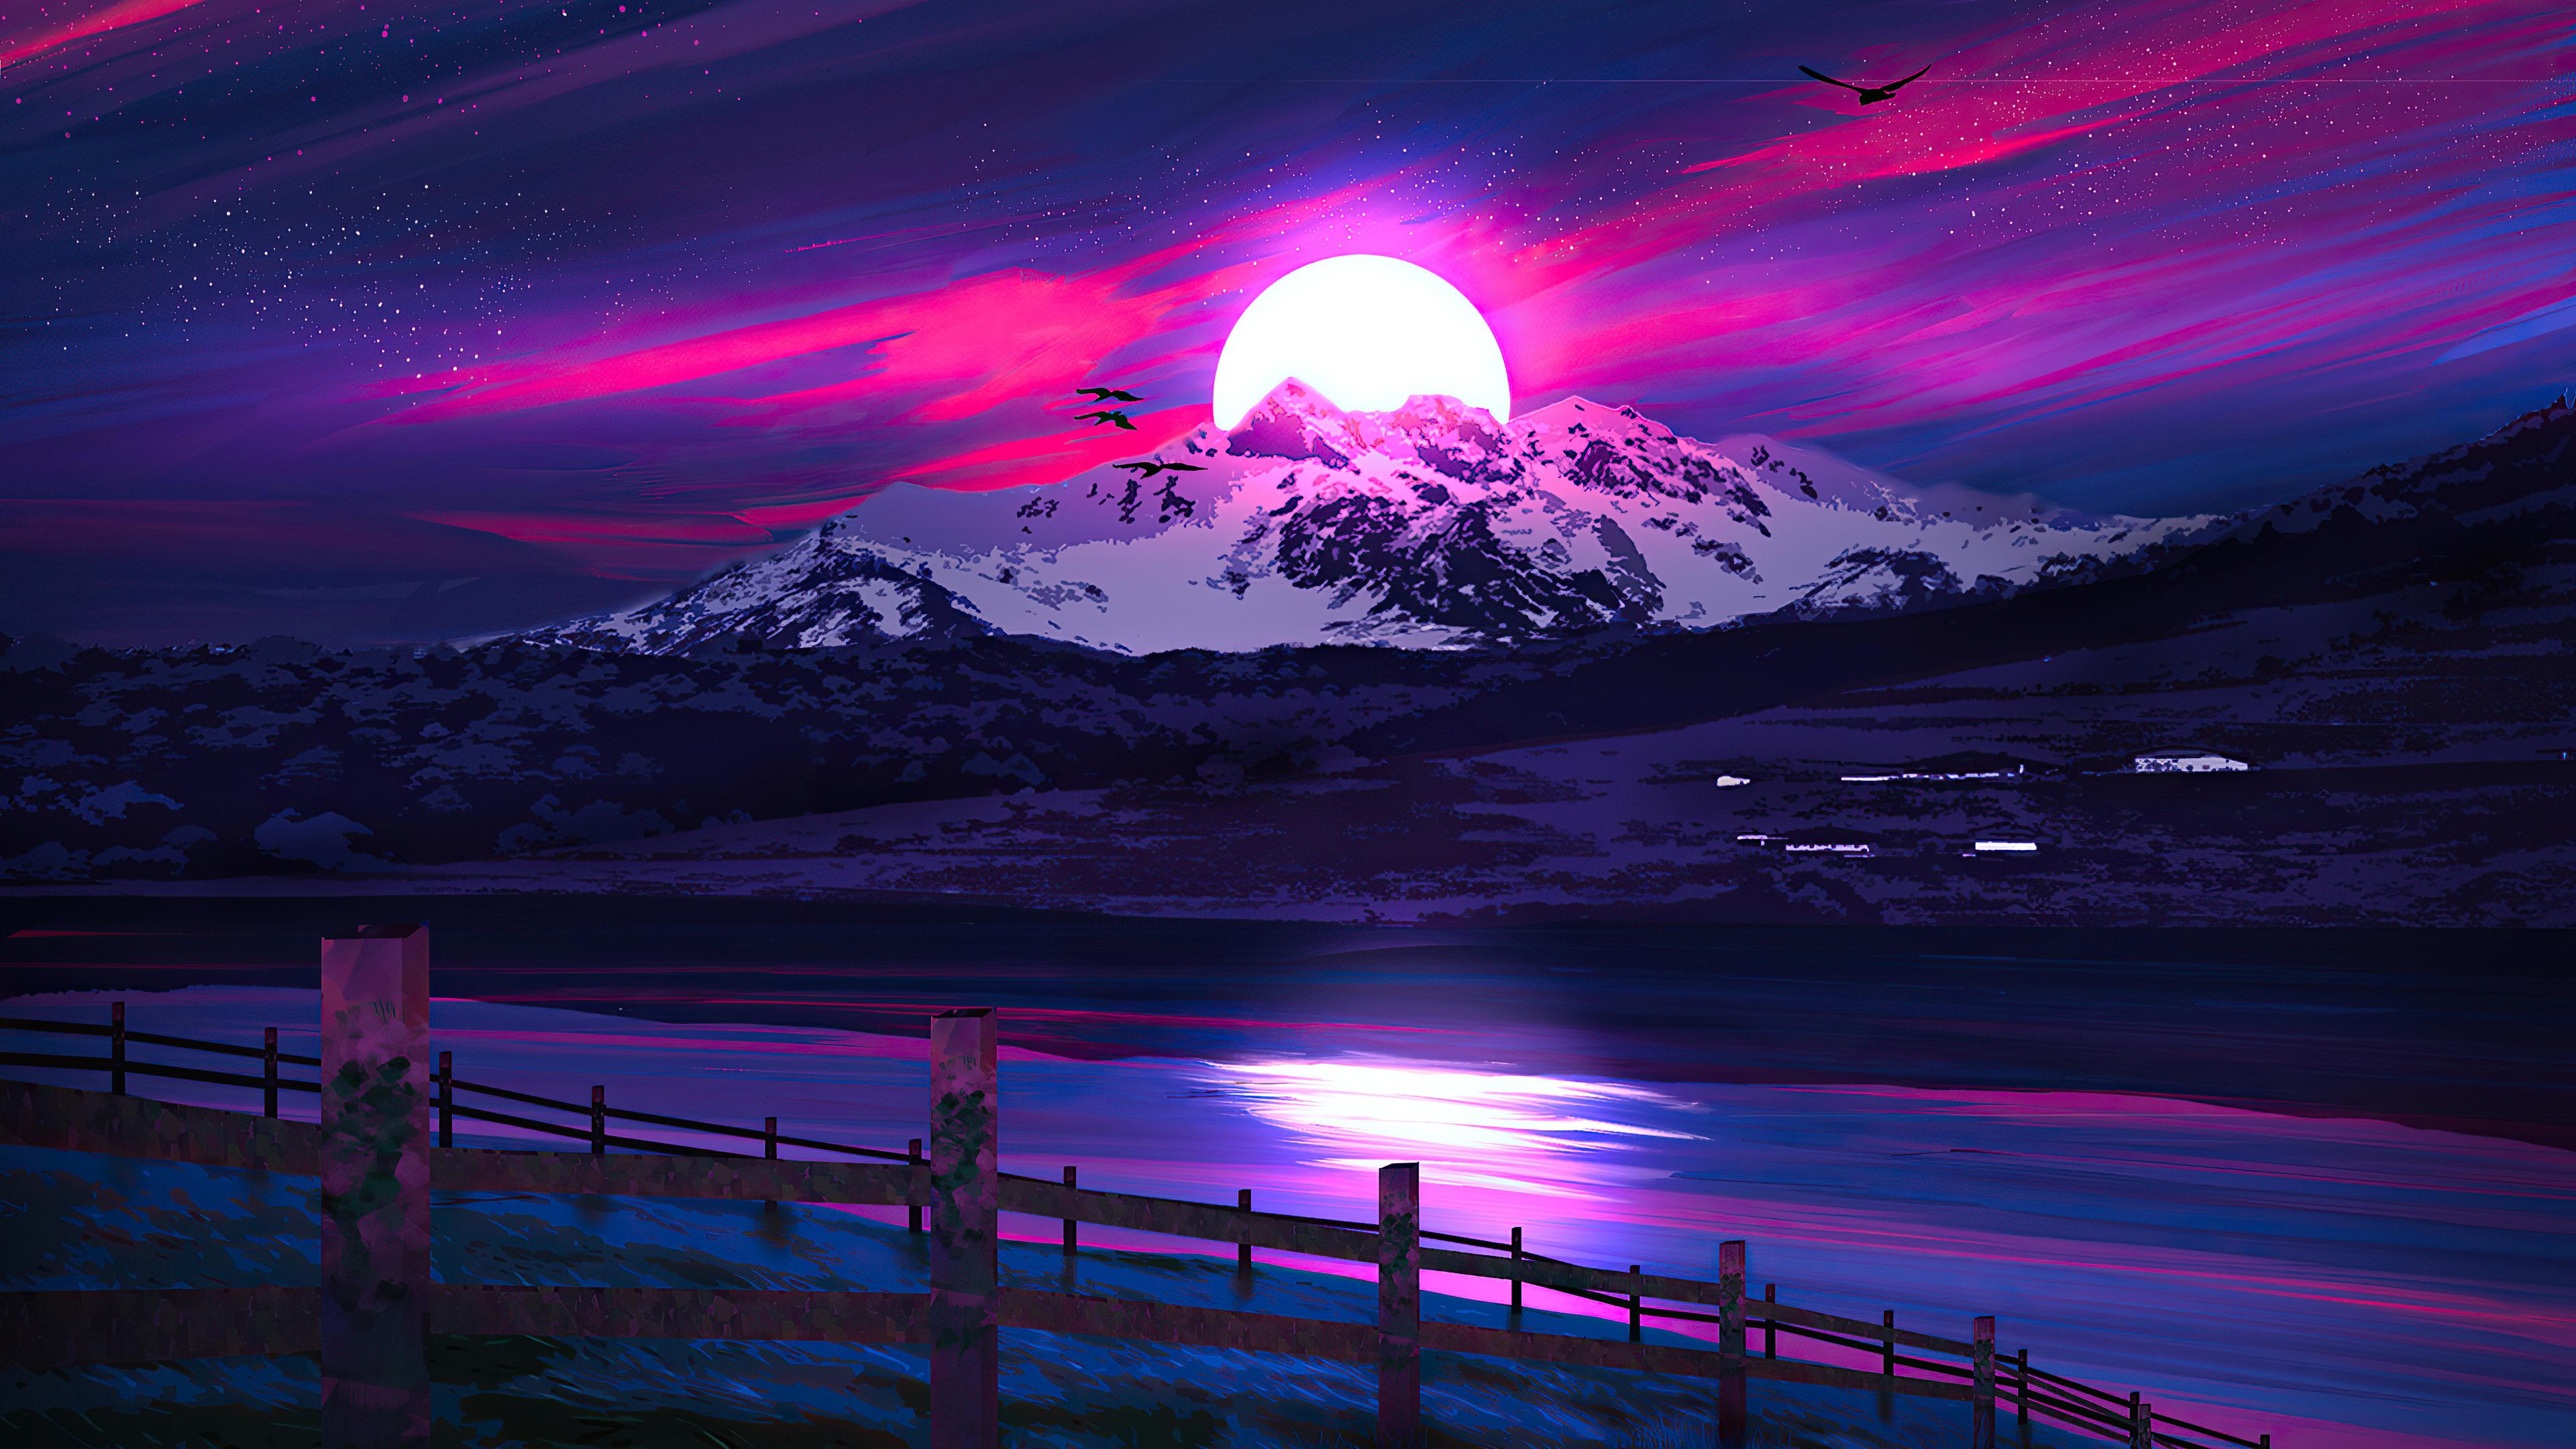 General 3840x2160 vector landscape colorful digital art